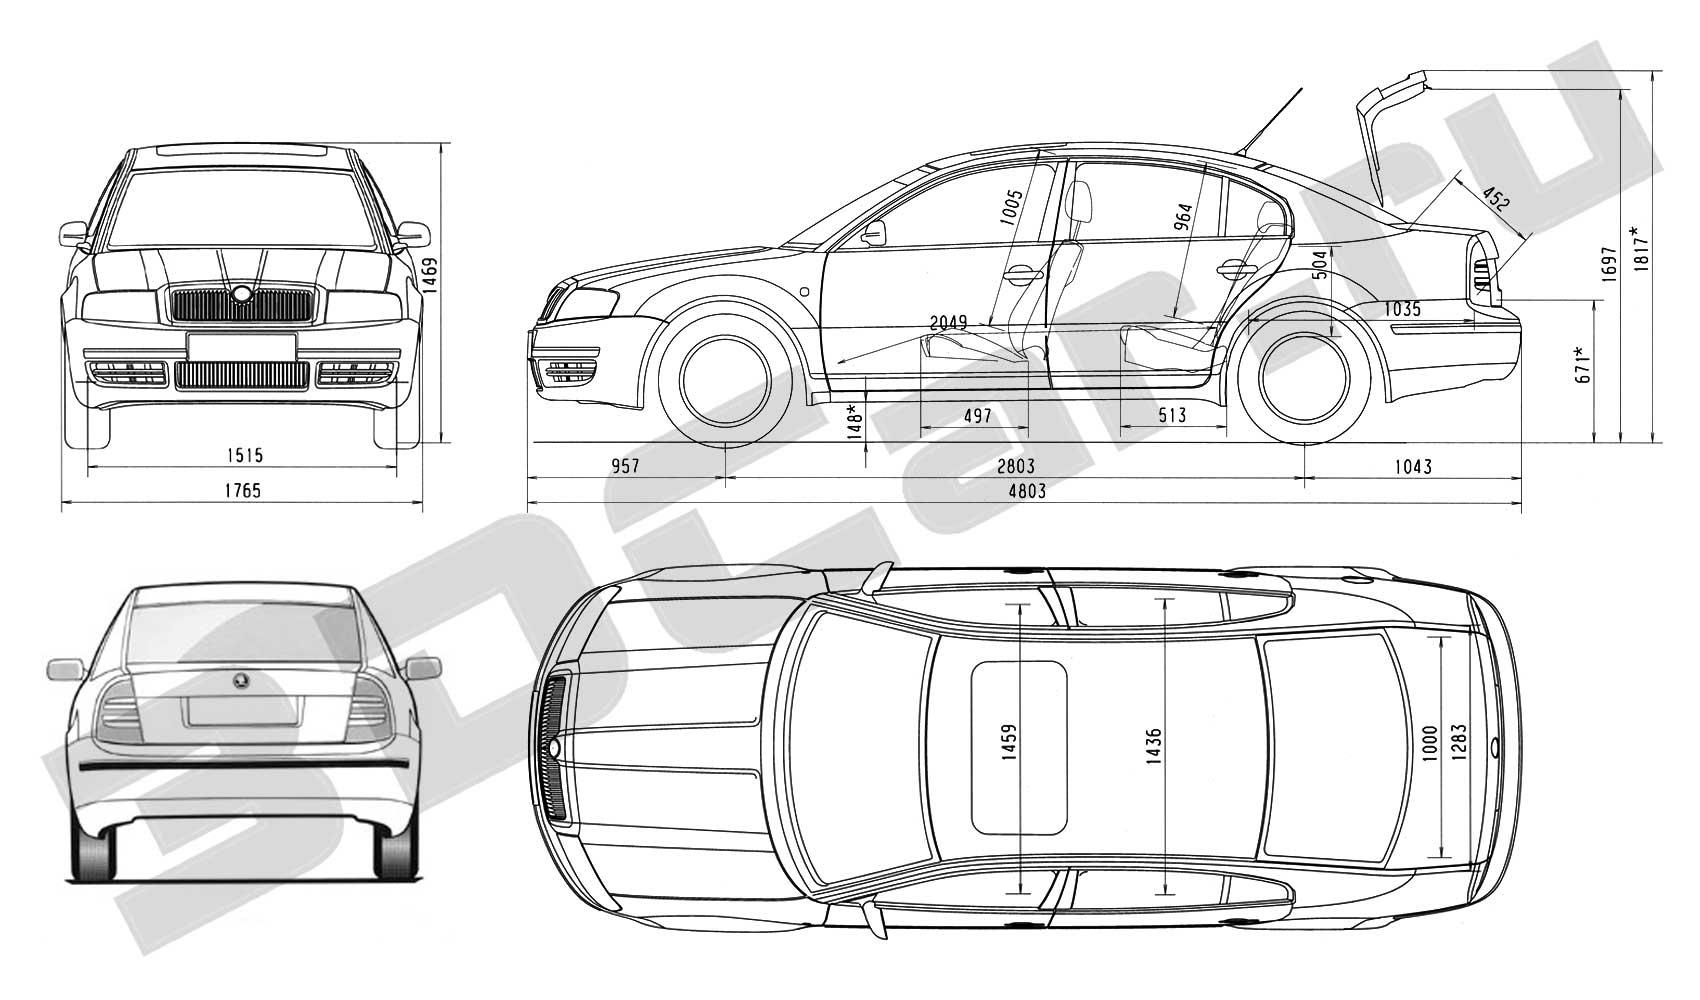 Http www 3dcar ru blueprints skoda skodasuperb